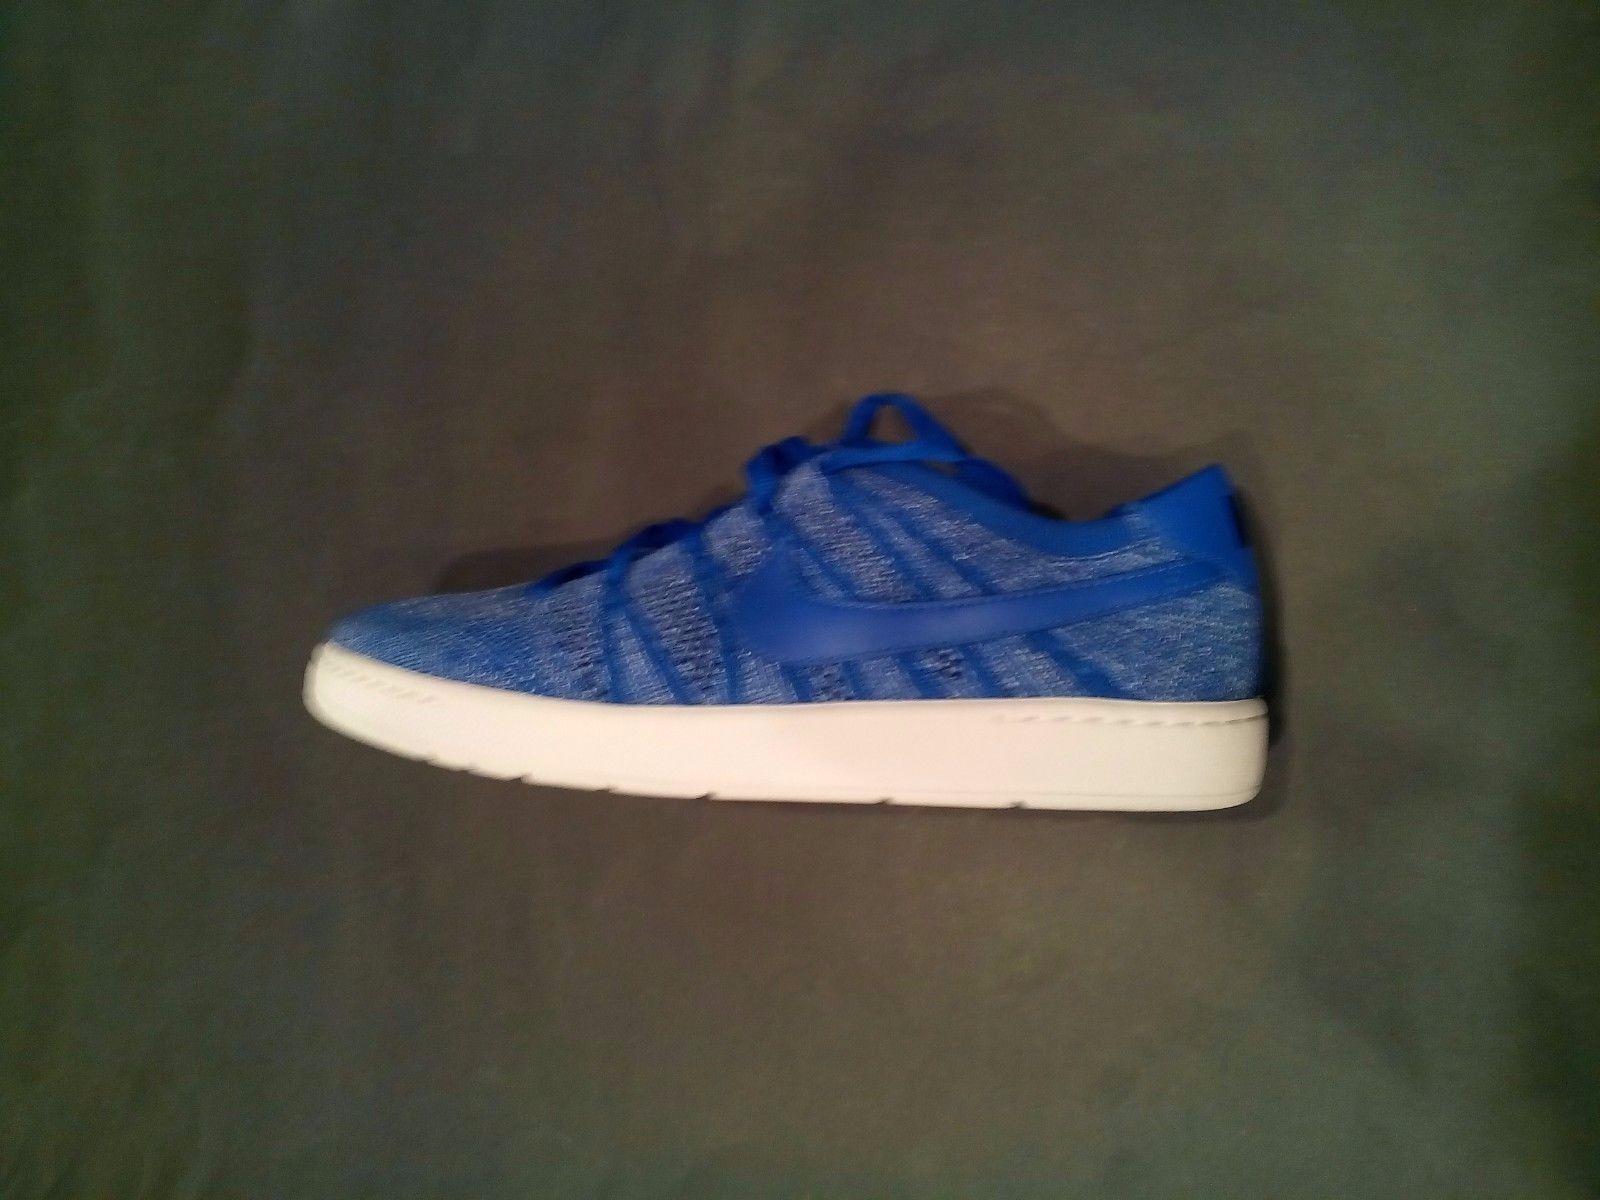 NIKE TENNIS CLASSIC ULTRA FLYKNIT Men's Shoes 830704 400 Blue White sz 10